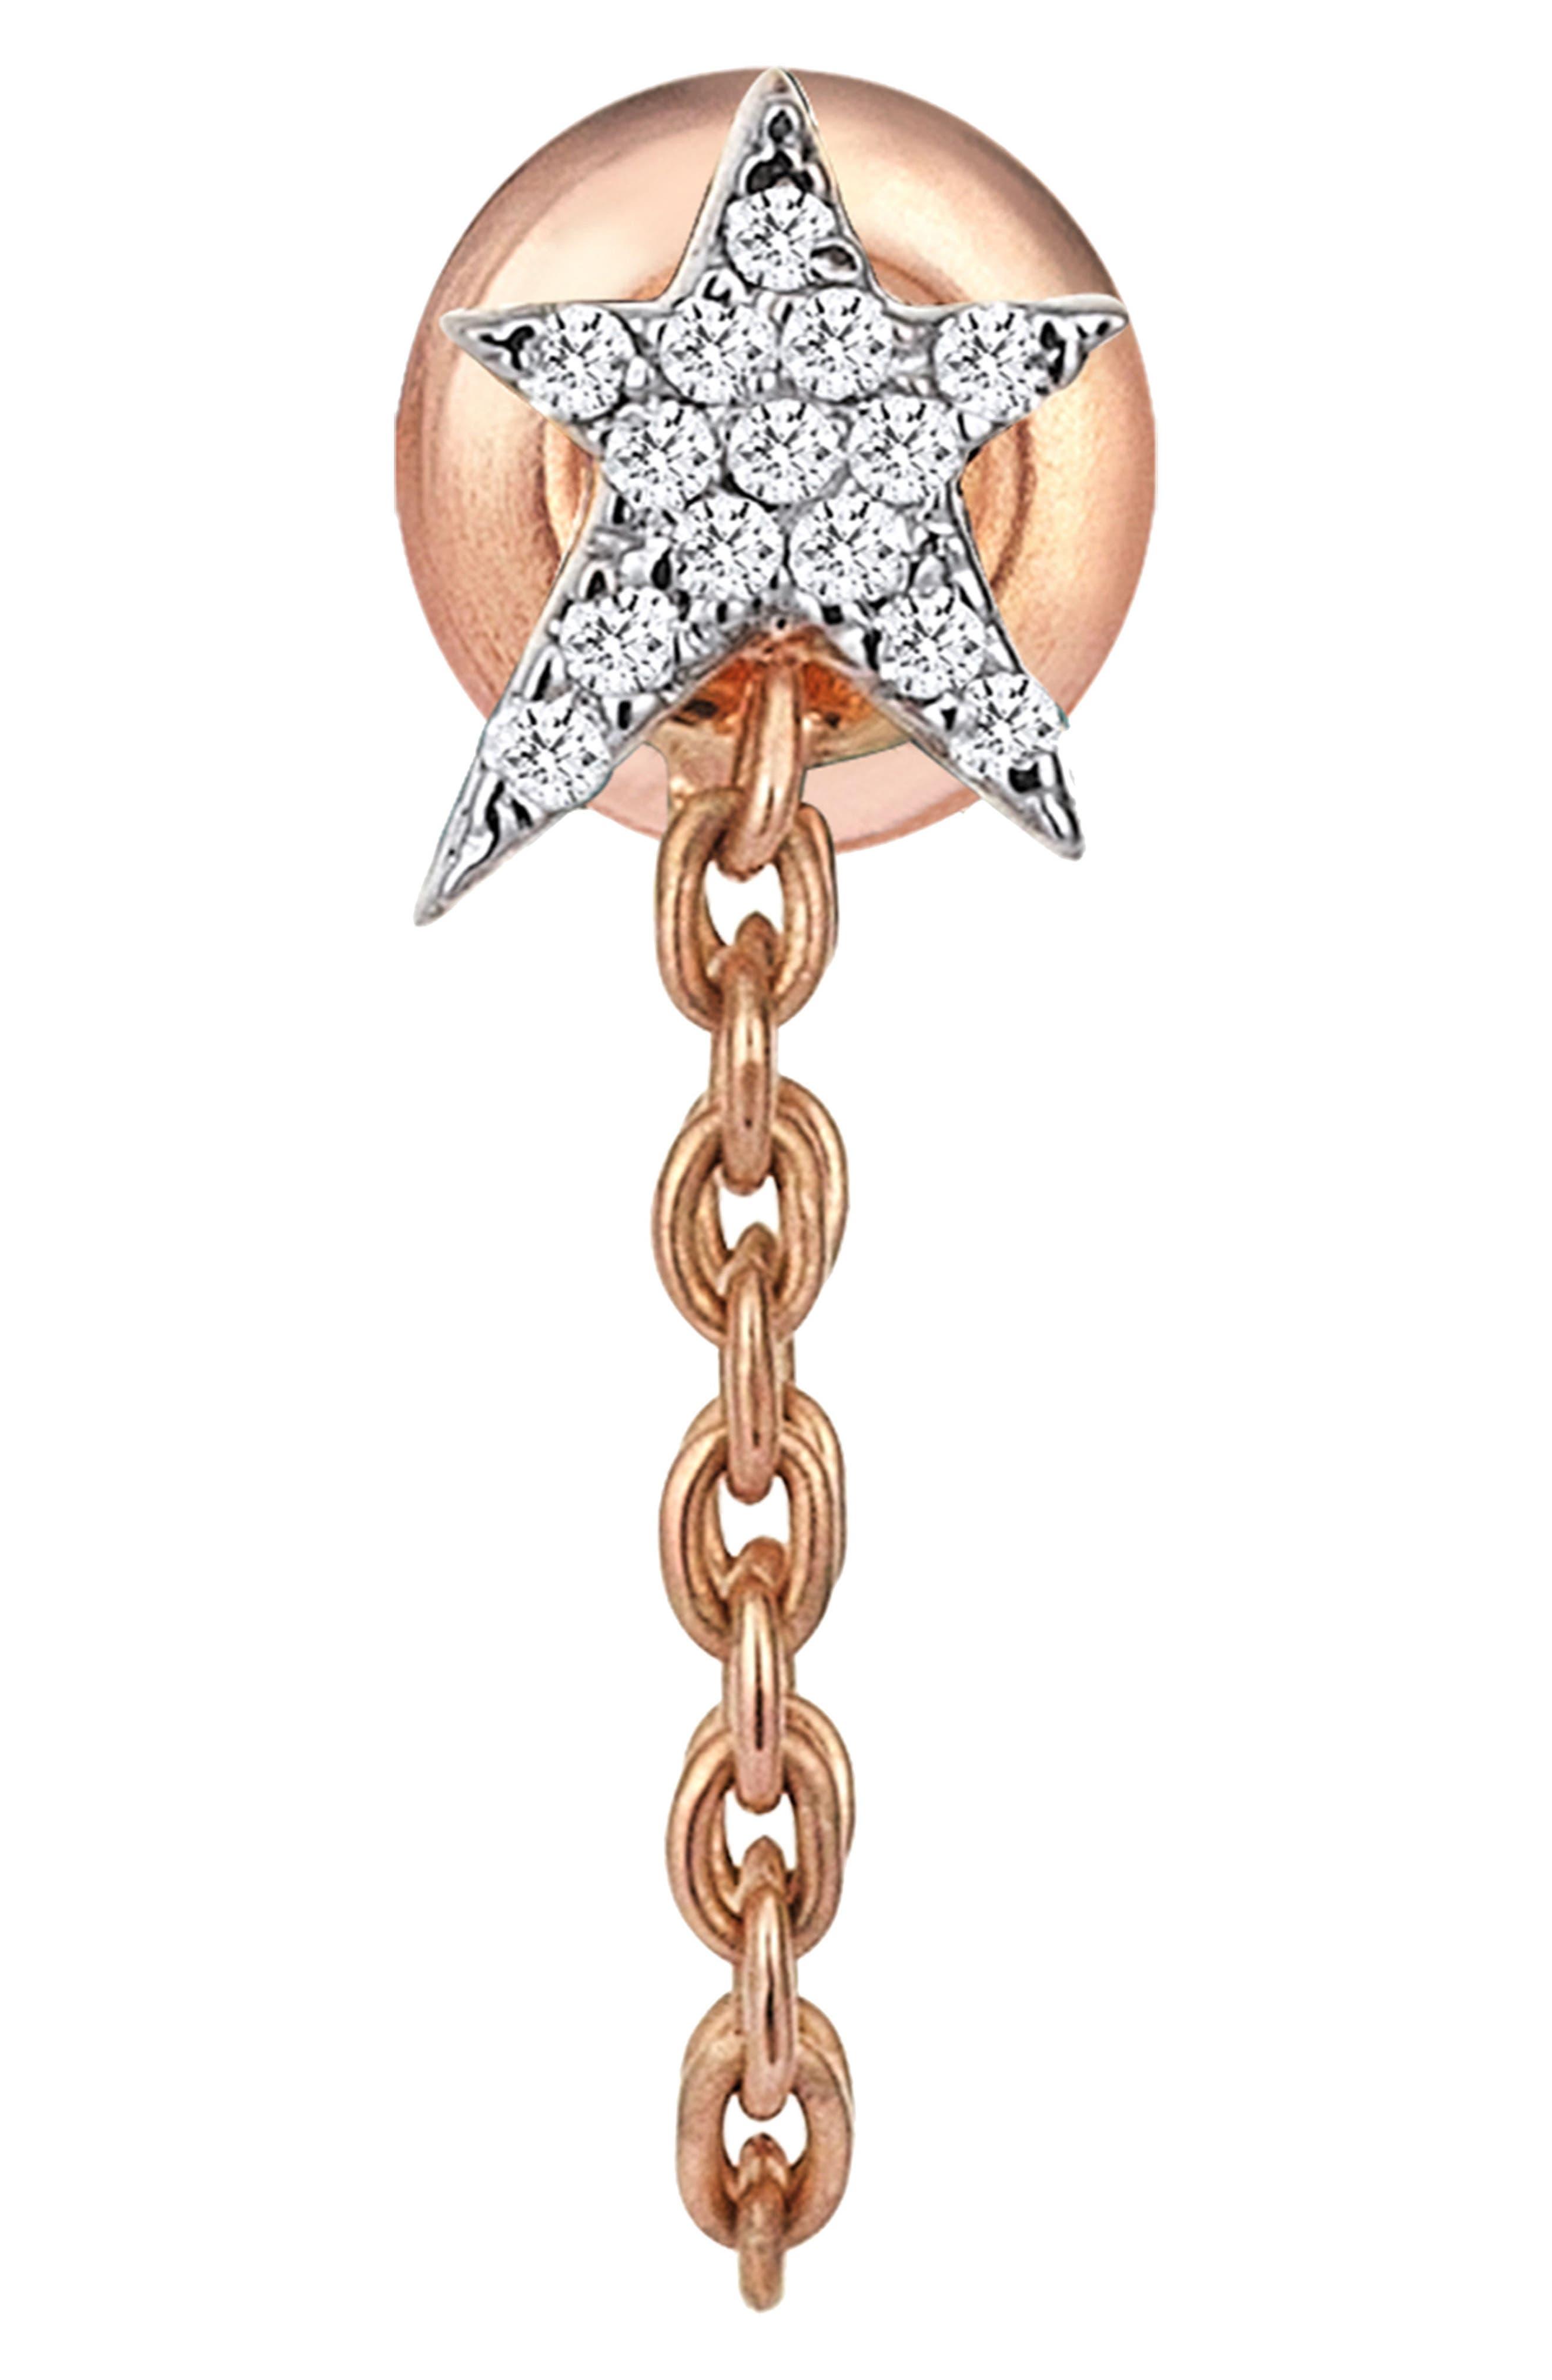 KISMET BY MILKA, Struck Star Diamond Chain Earring, Main thumbnail 1, color, ROSE GOLD